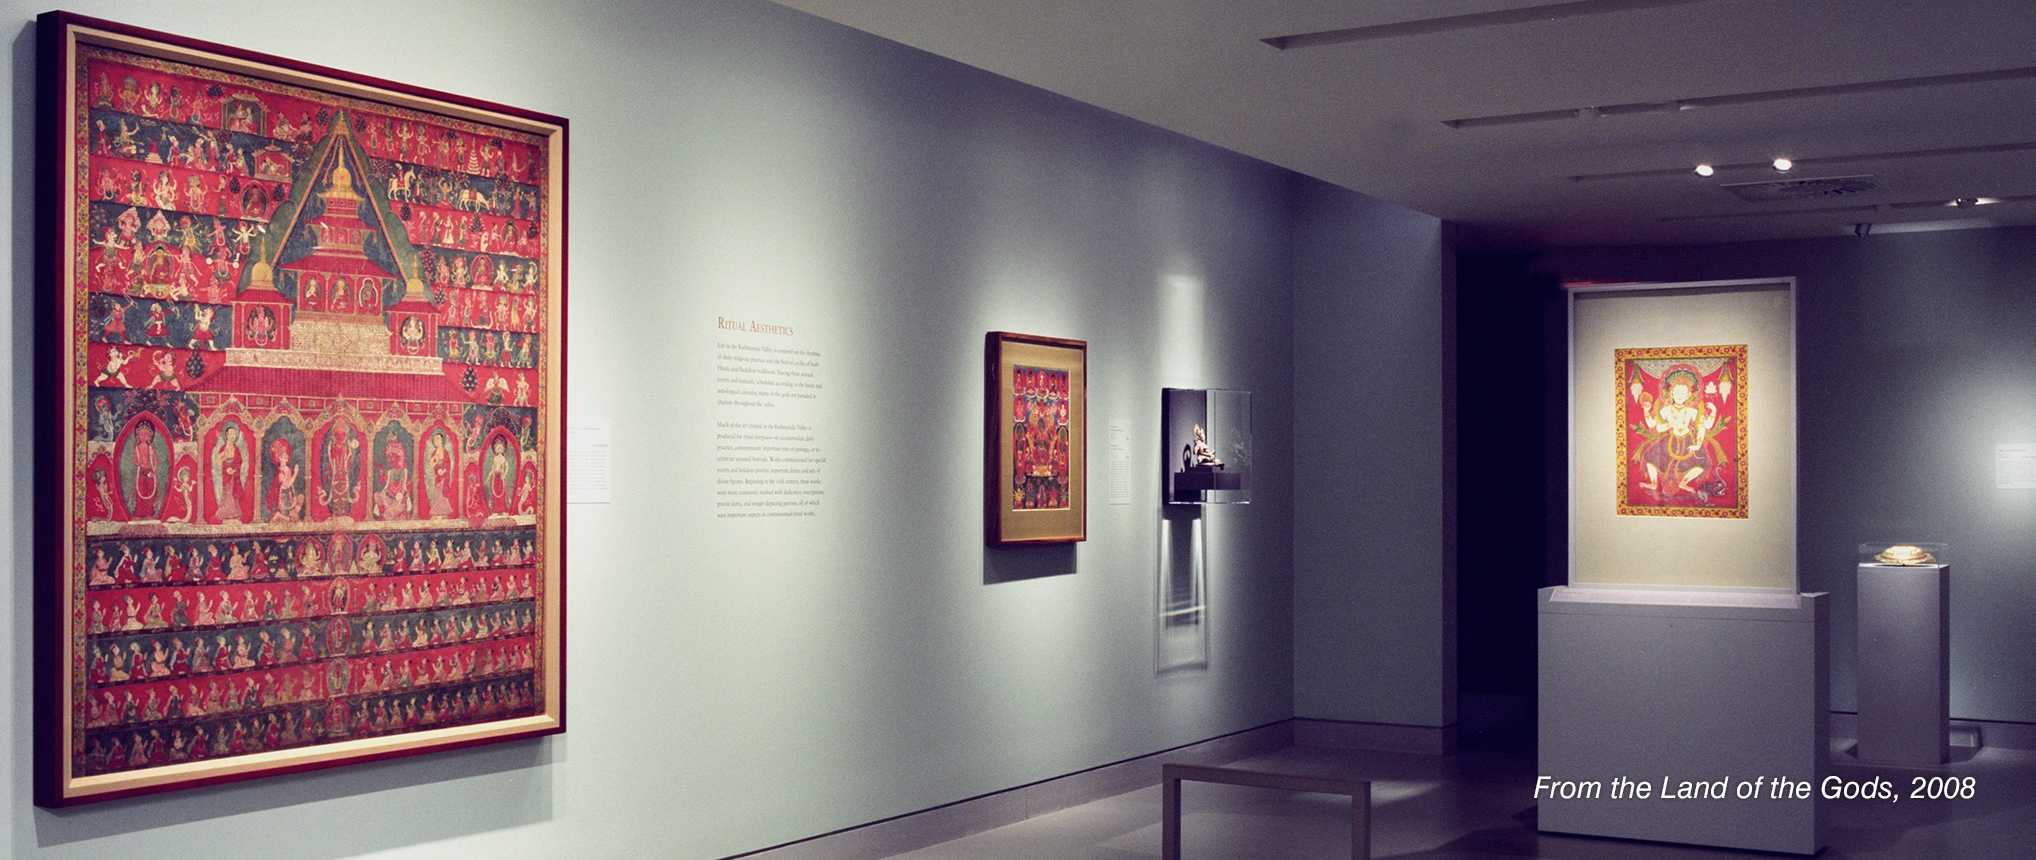 Mizzen reccomend Asian galleries com